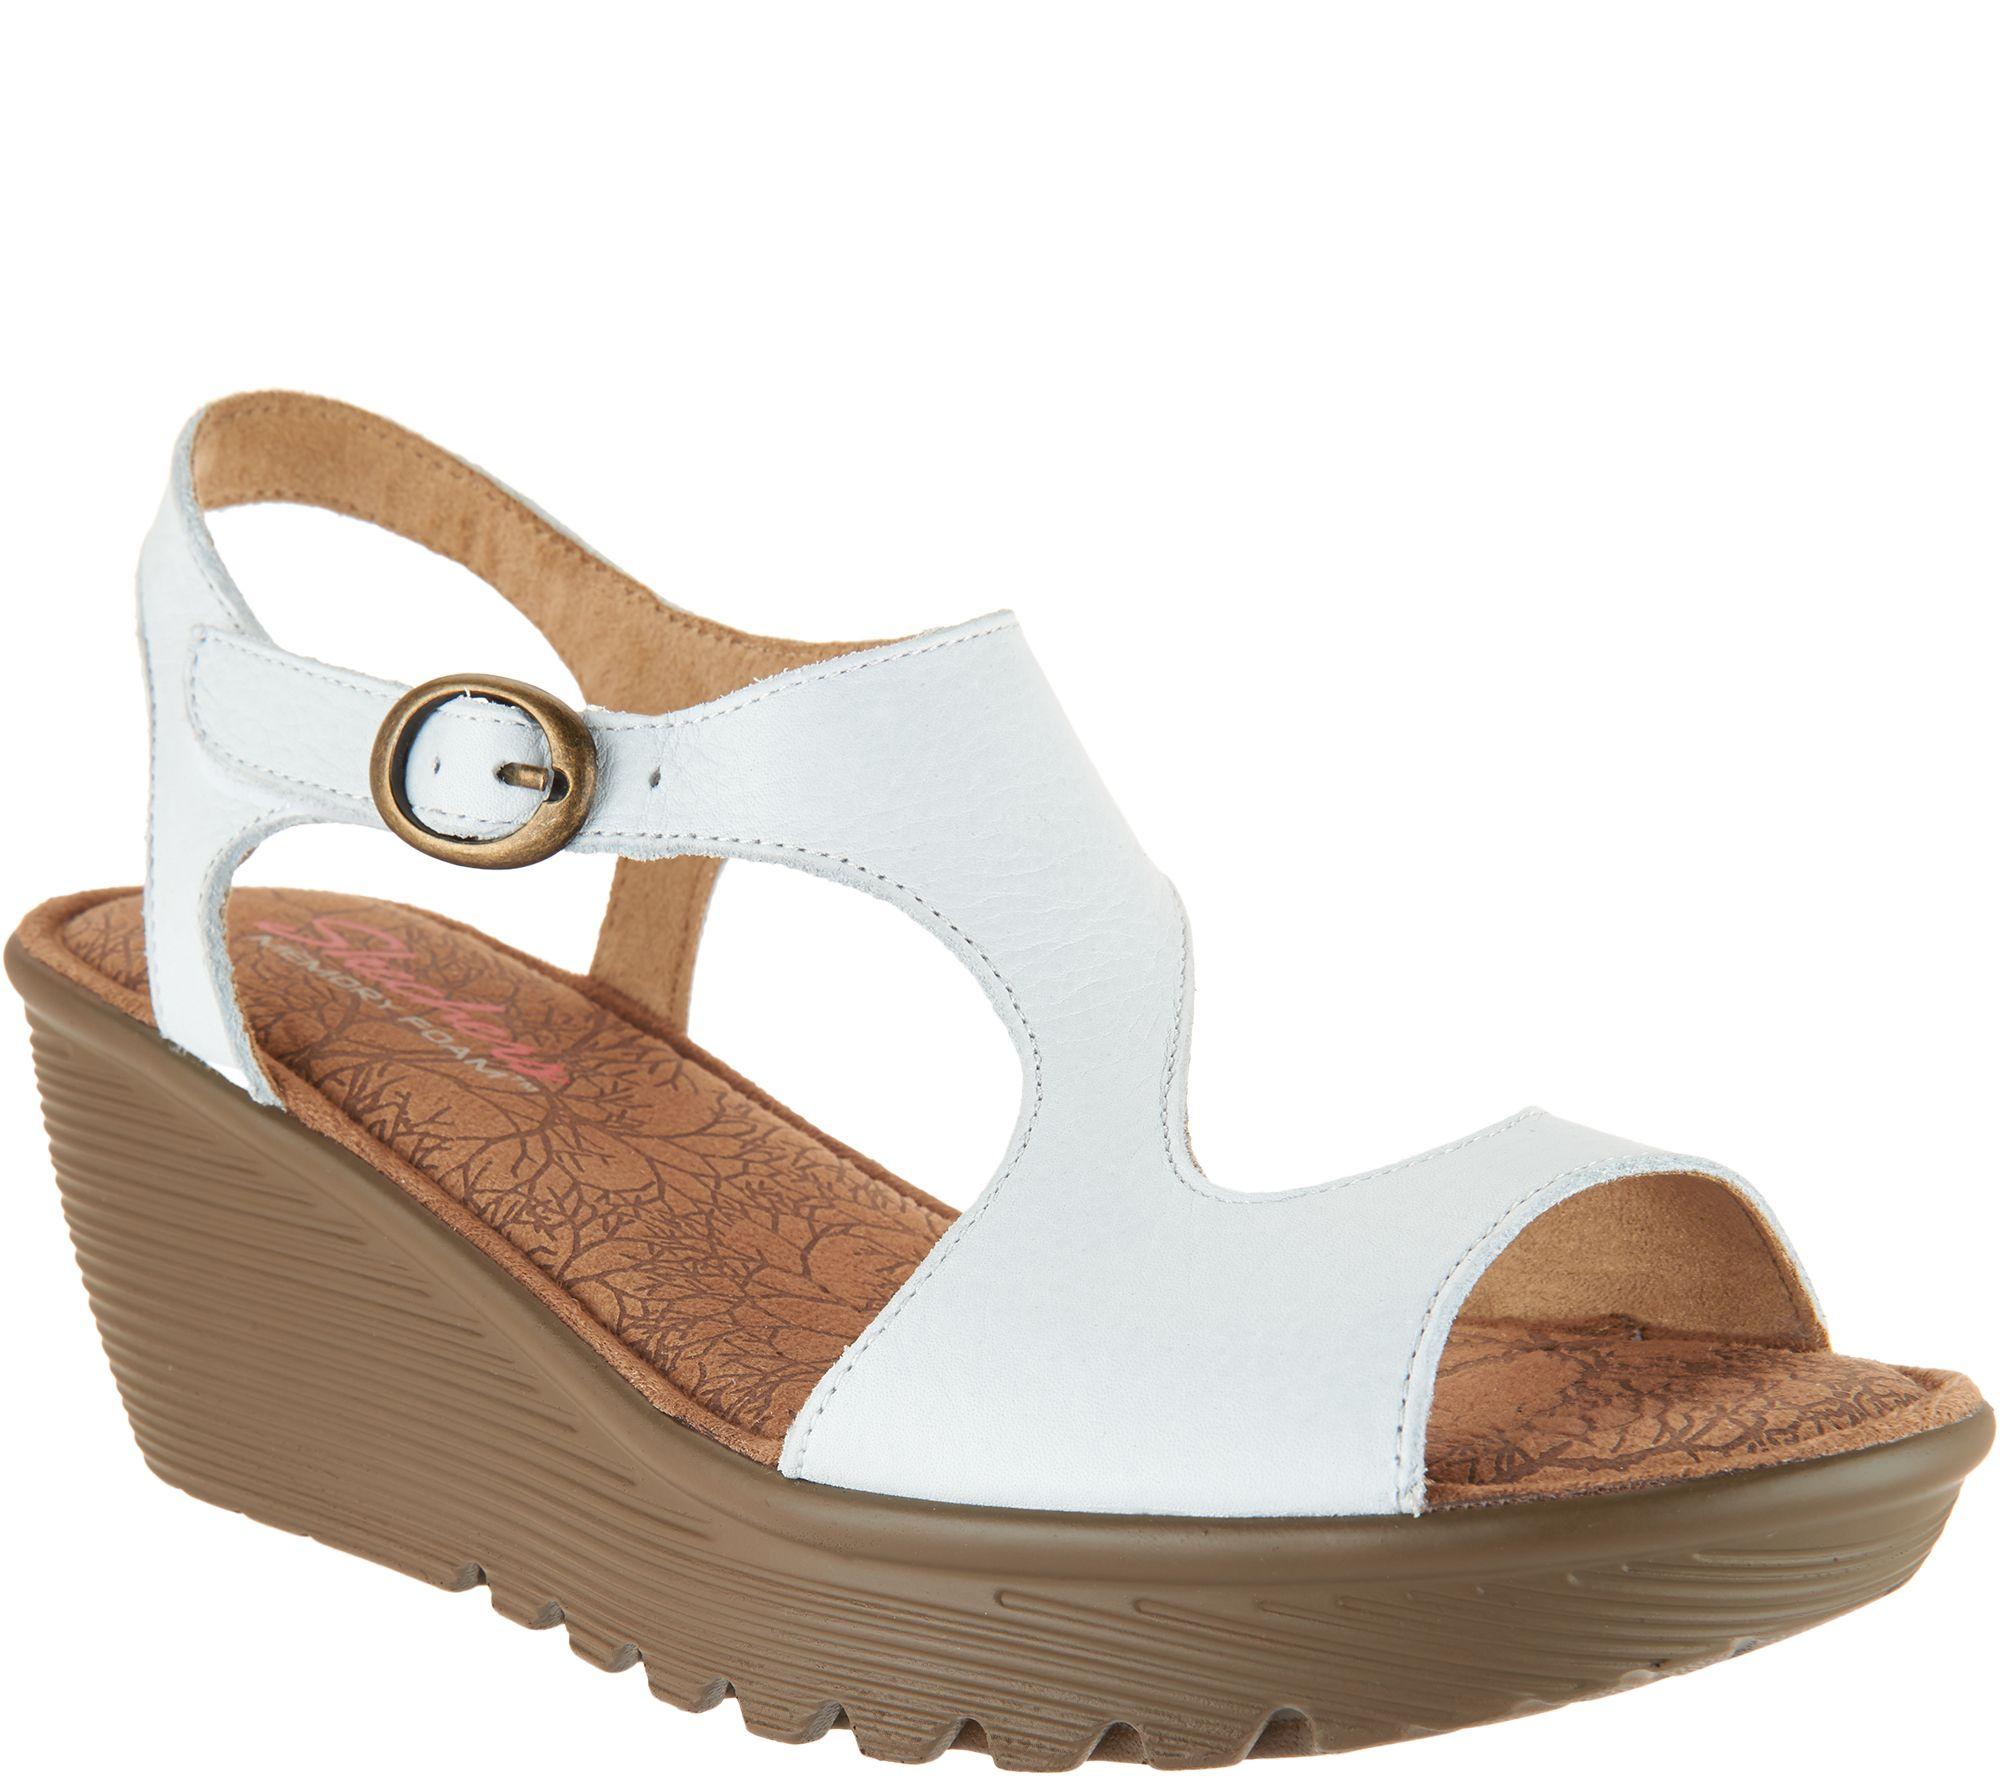 Womens sandals marshalls - Womens Sandals Marshalls 44